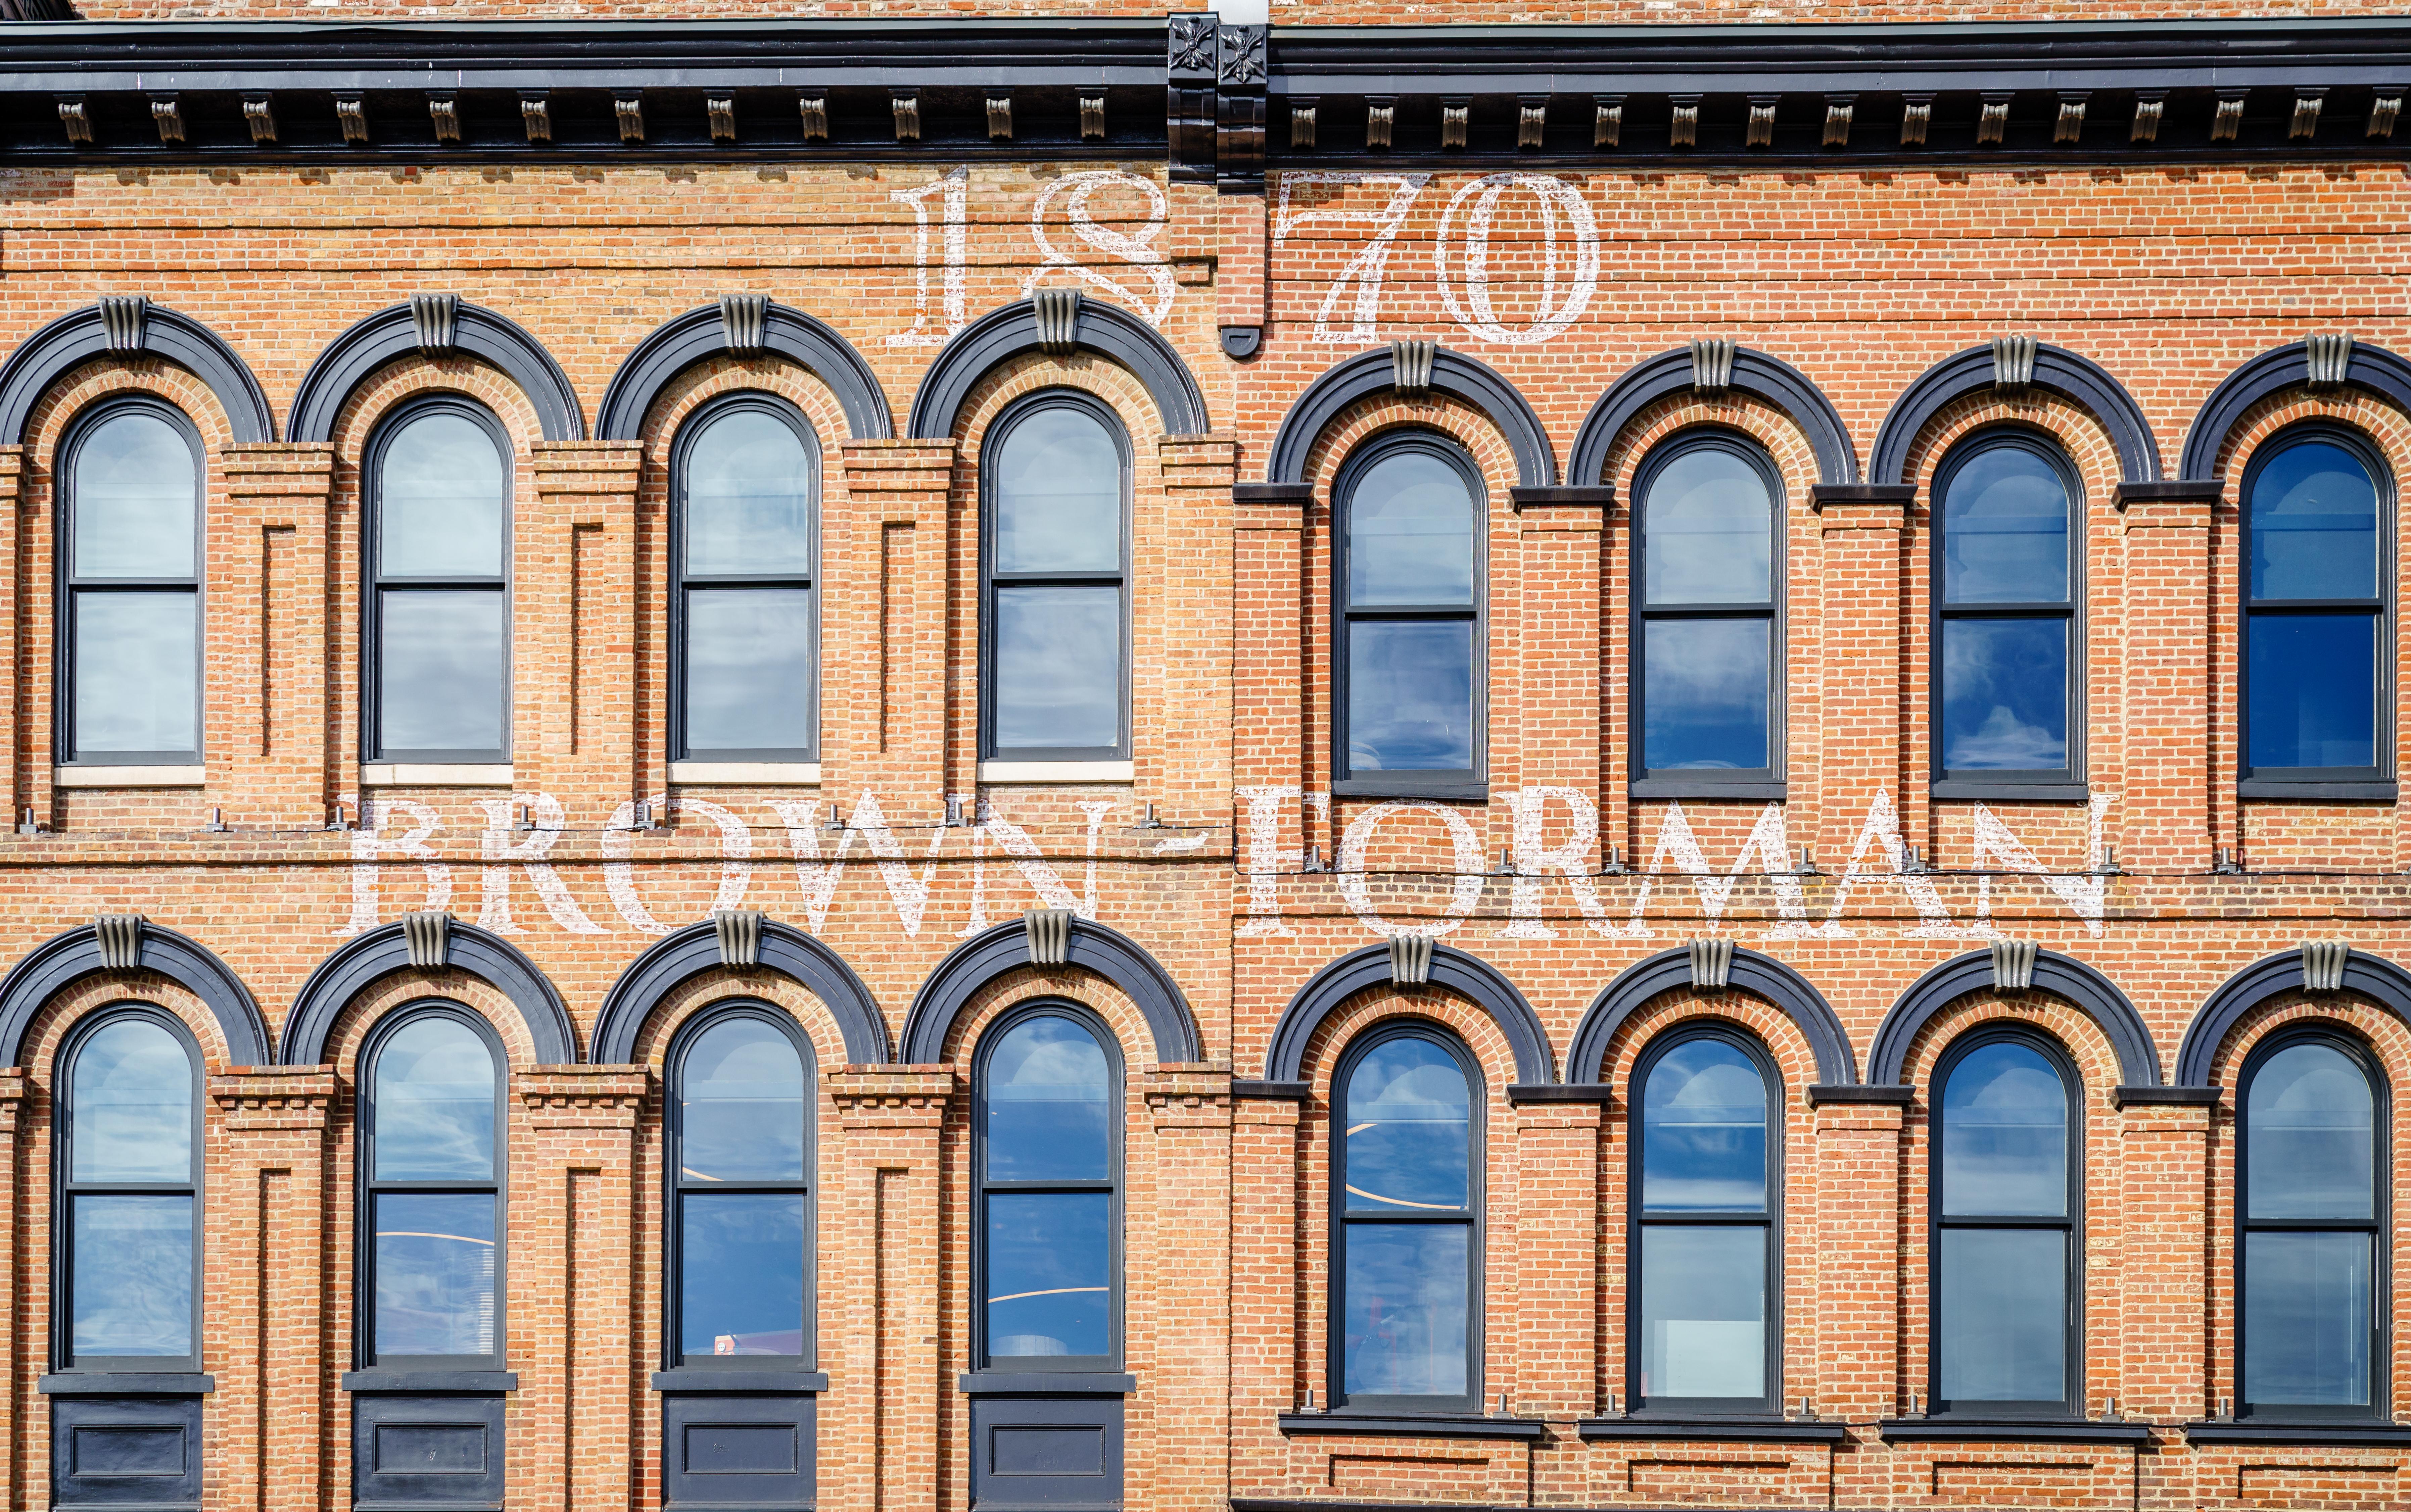 Louisville, KY, February 23, 2020: Façade of the Brown-Forman Corporation building in Louisville, Kentucky